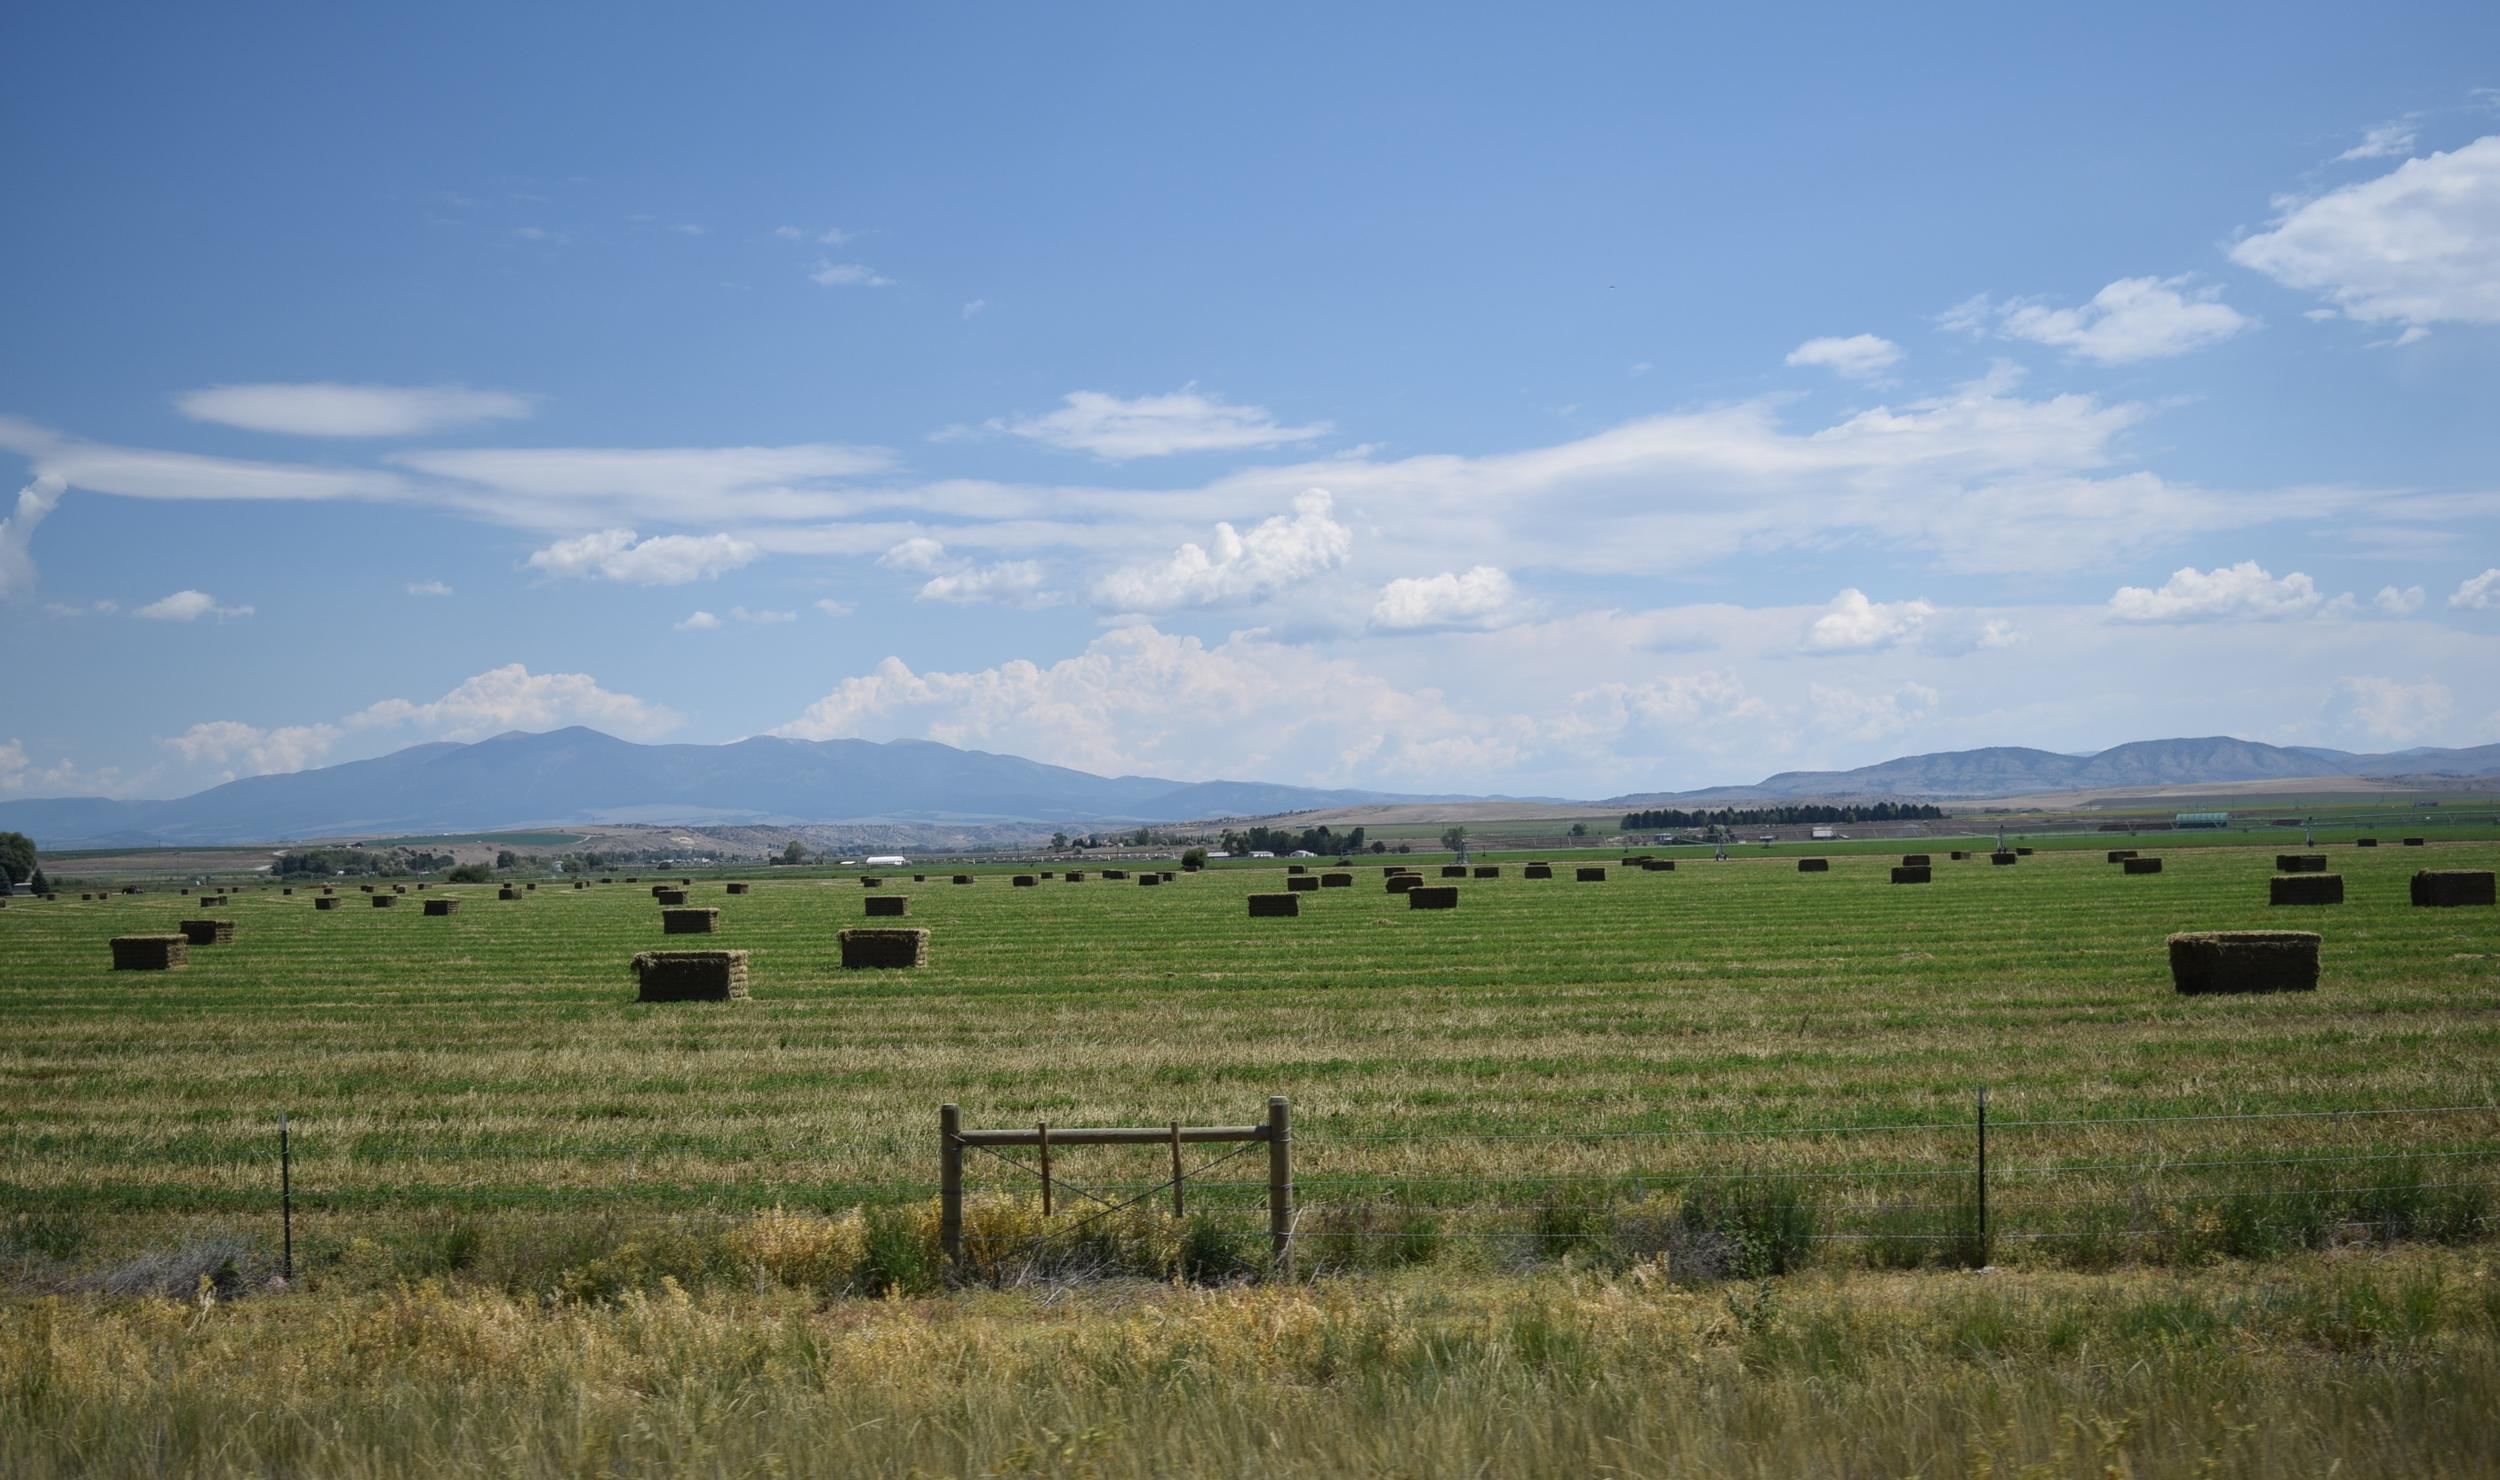 This looks familiar! Montana